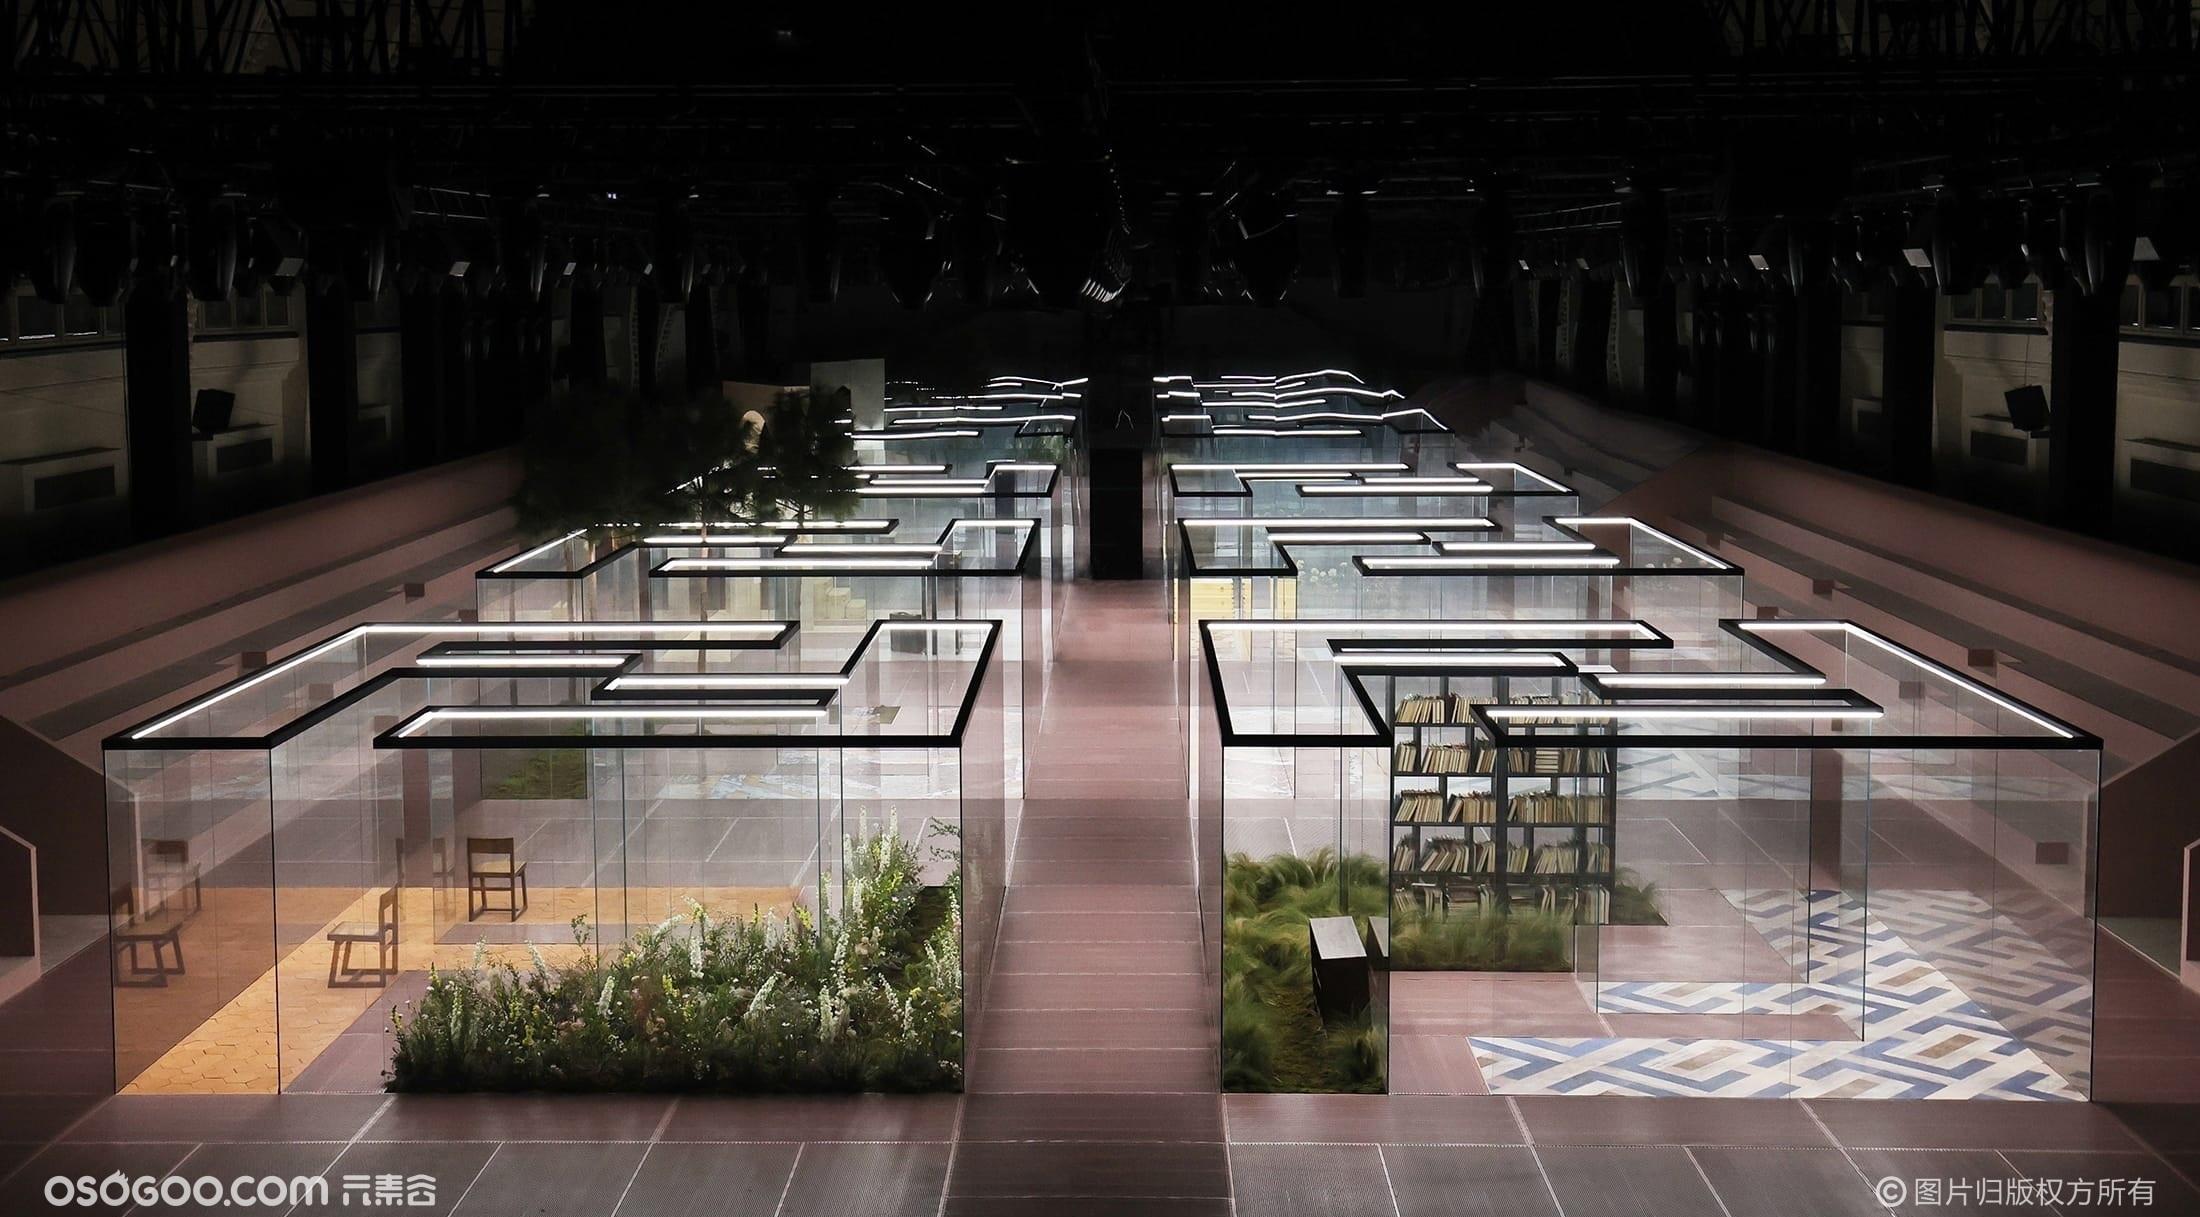 FENDI | 上海FENDI 2021春夏高级定制时装秀